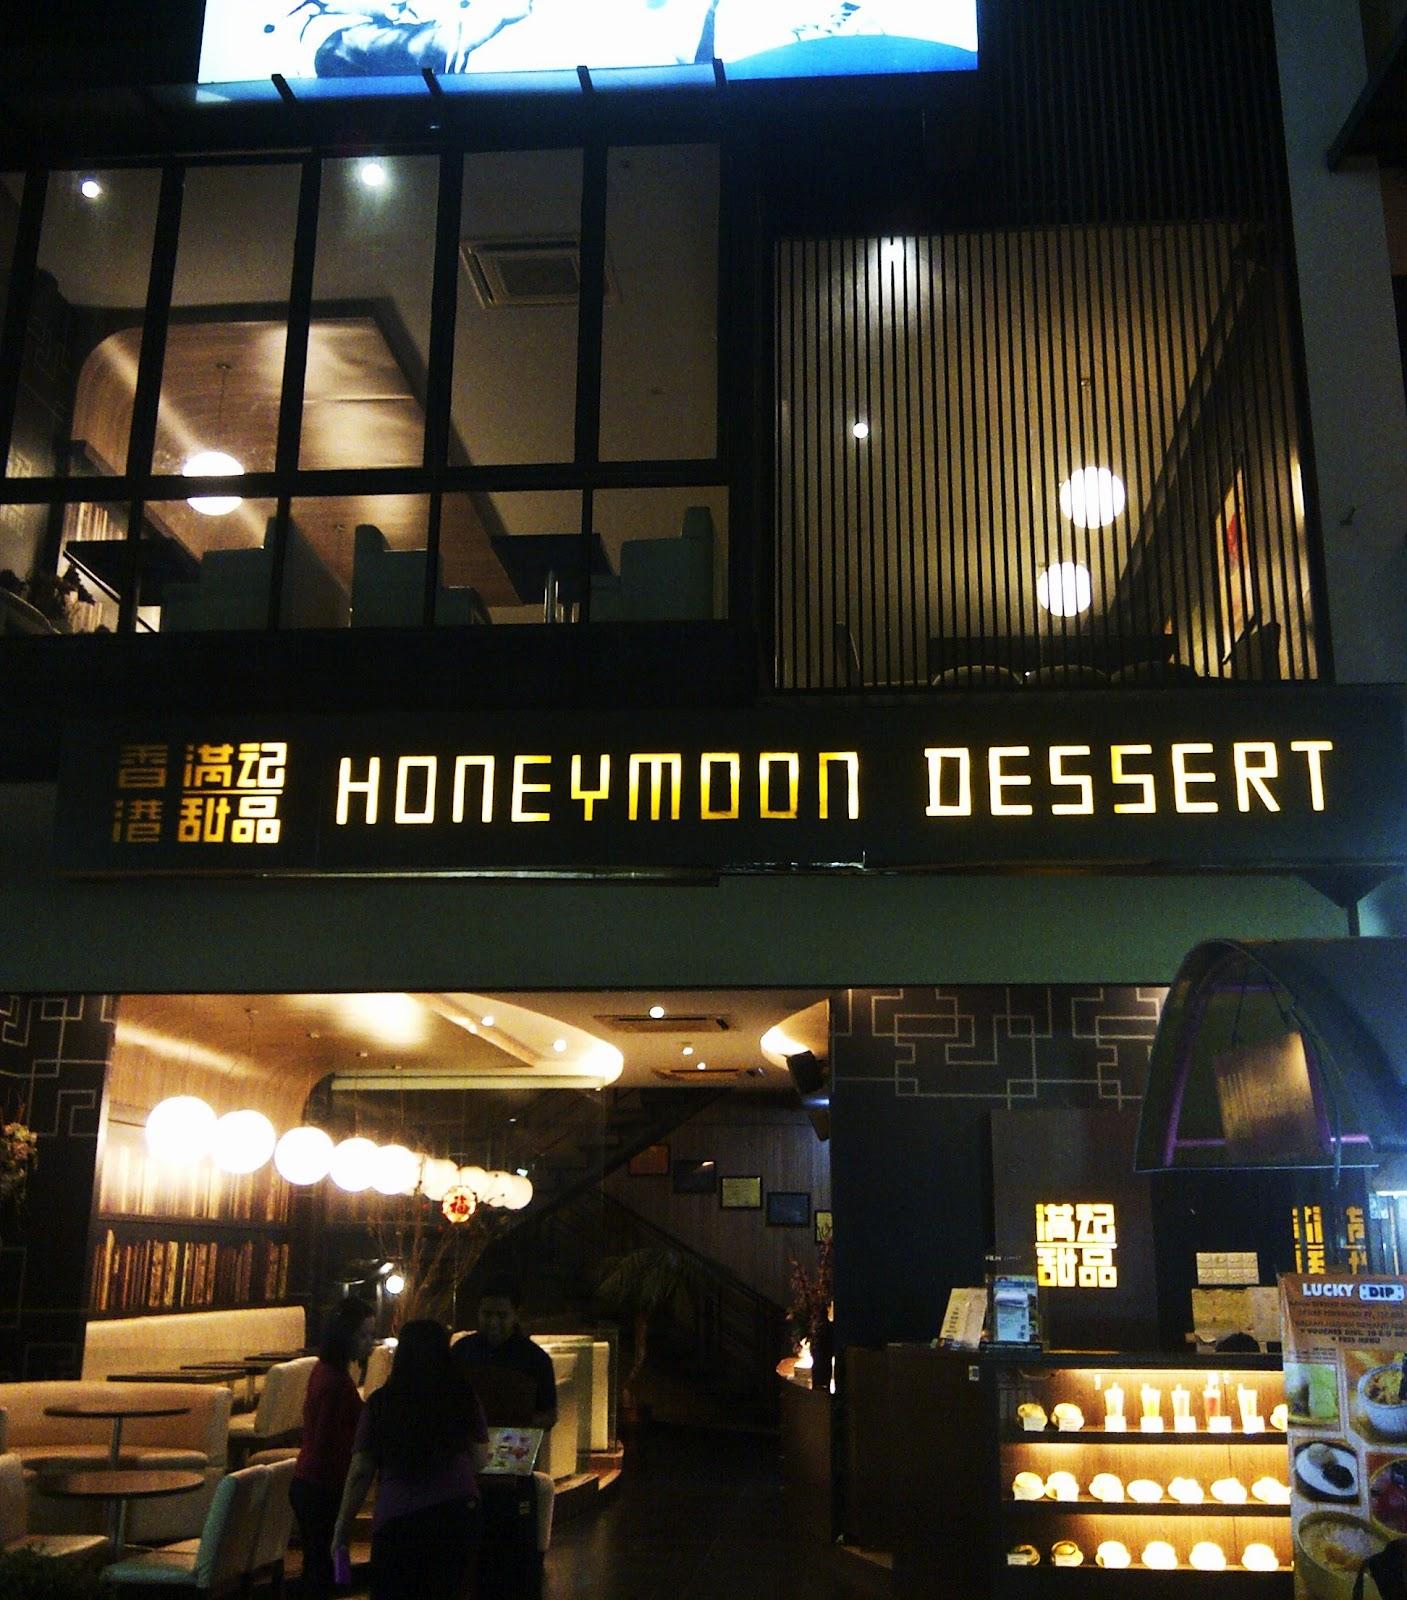 Honeymoon dessert Ciwalk